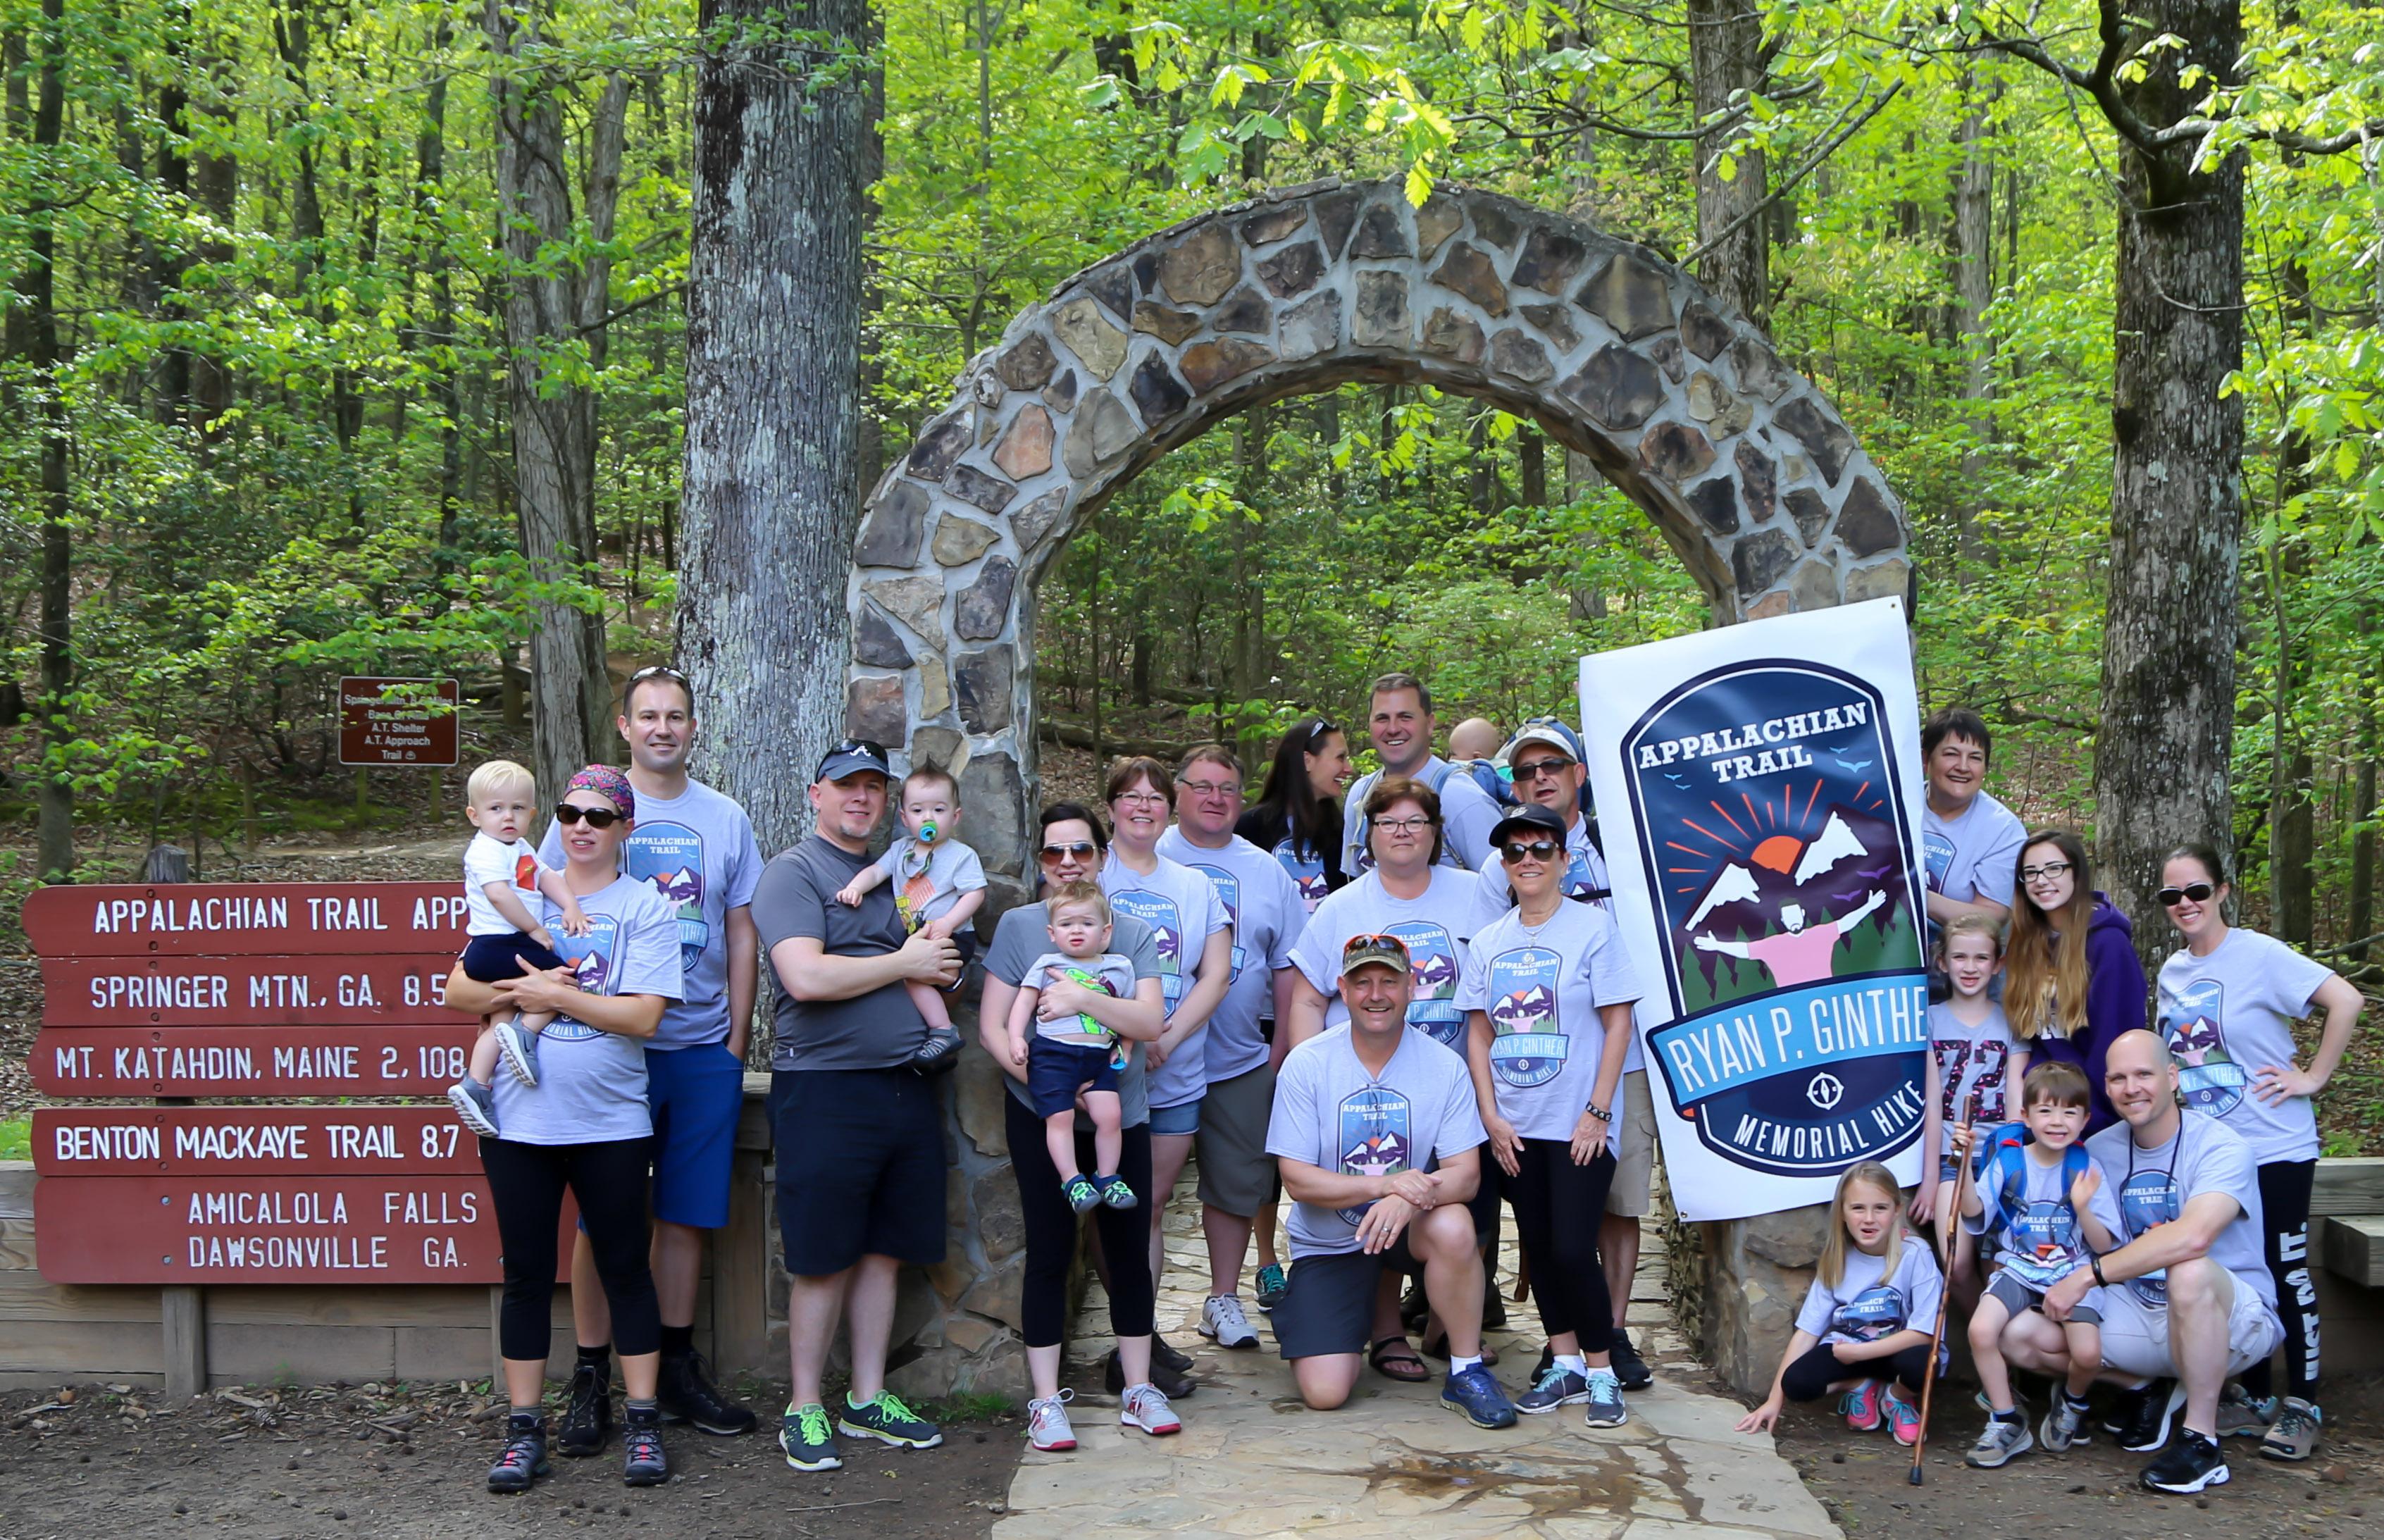 Ryan P. Ginther Memorial Hike